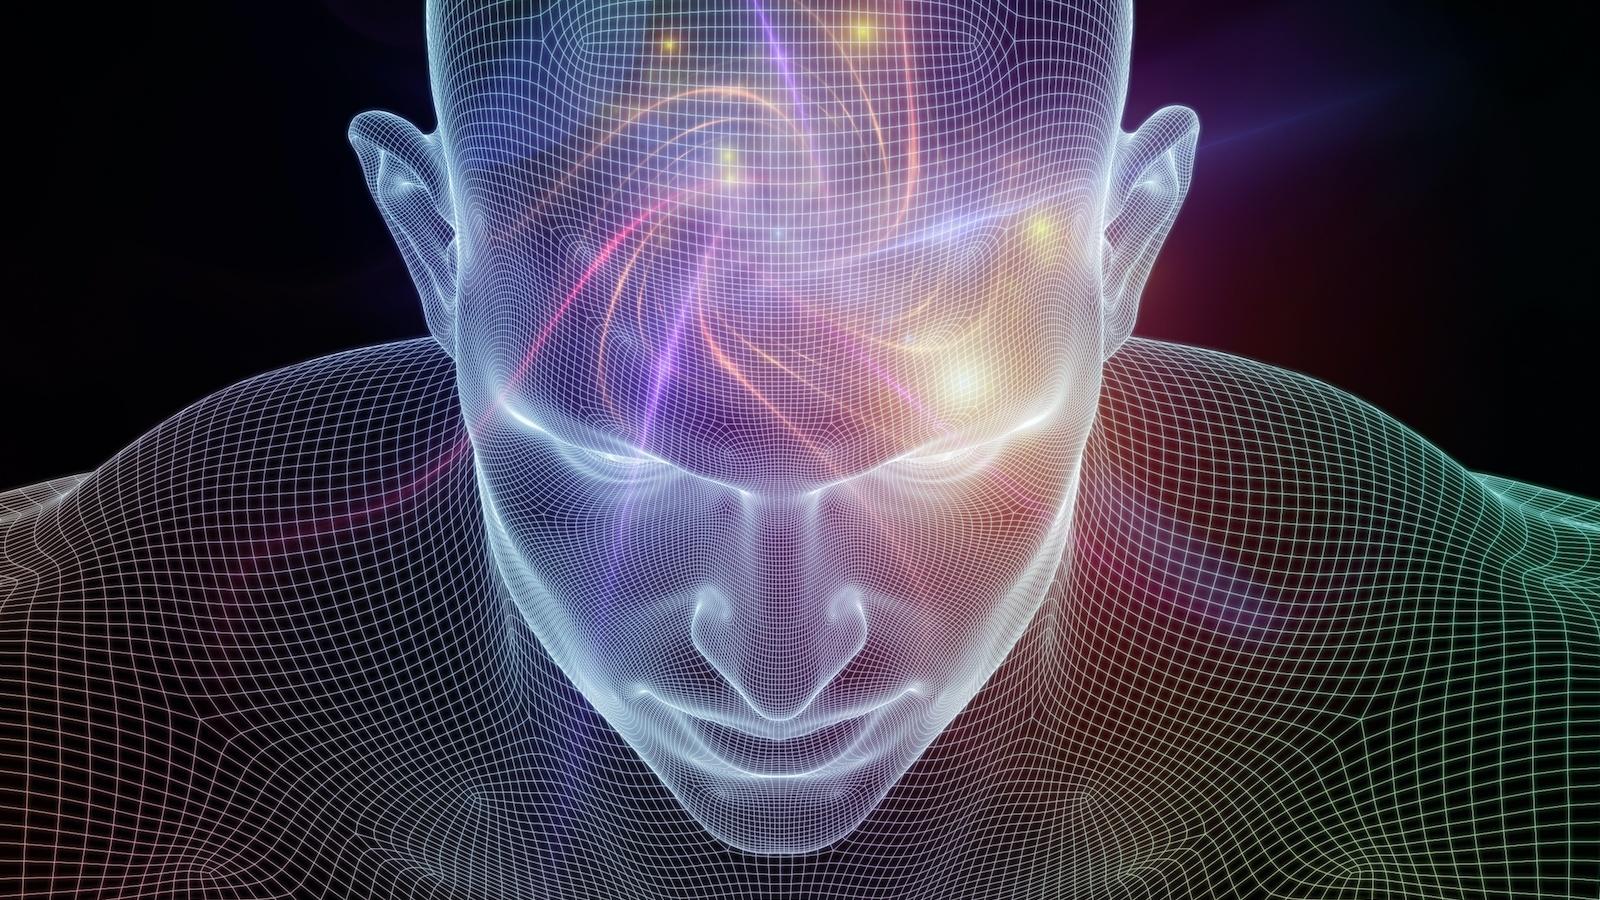 E.S.P.—Psychics and Spiritual Insight